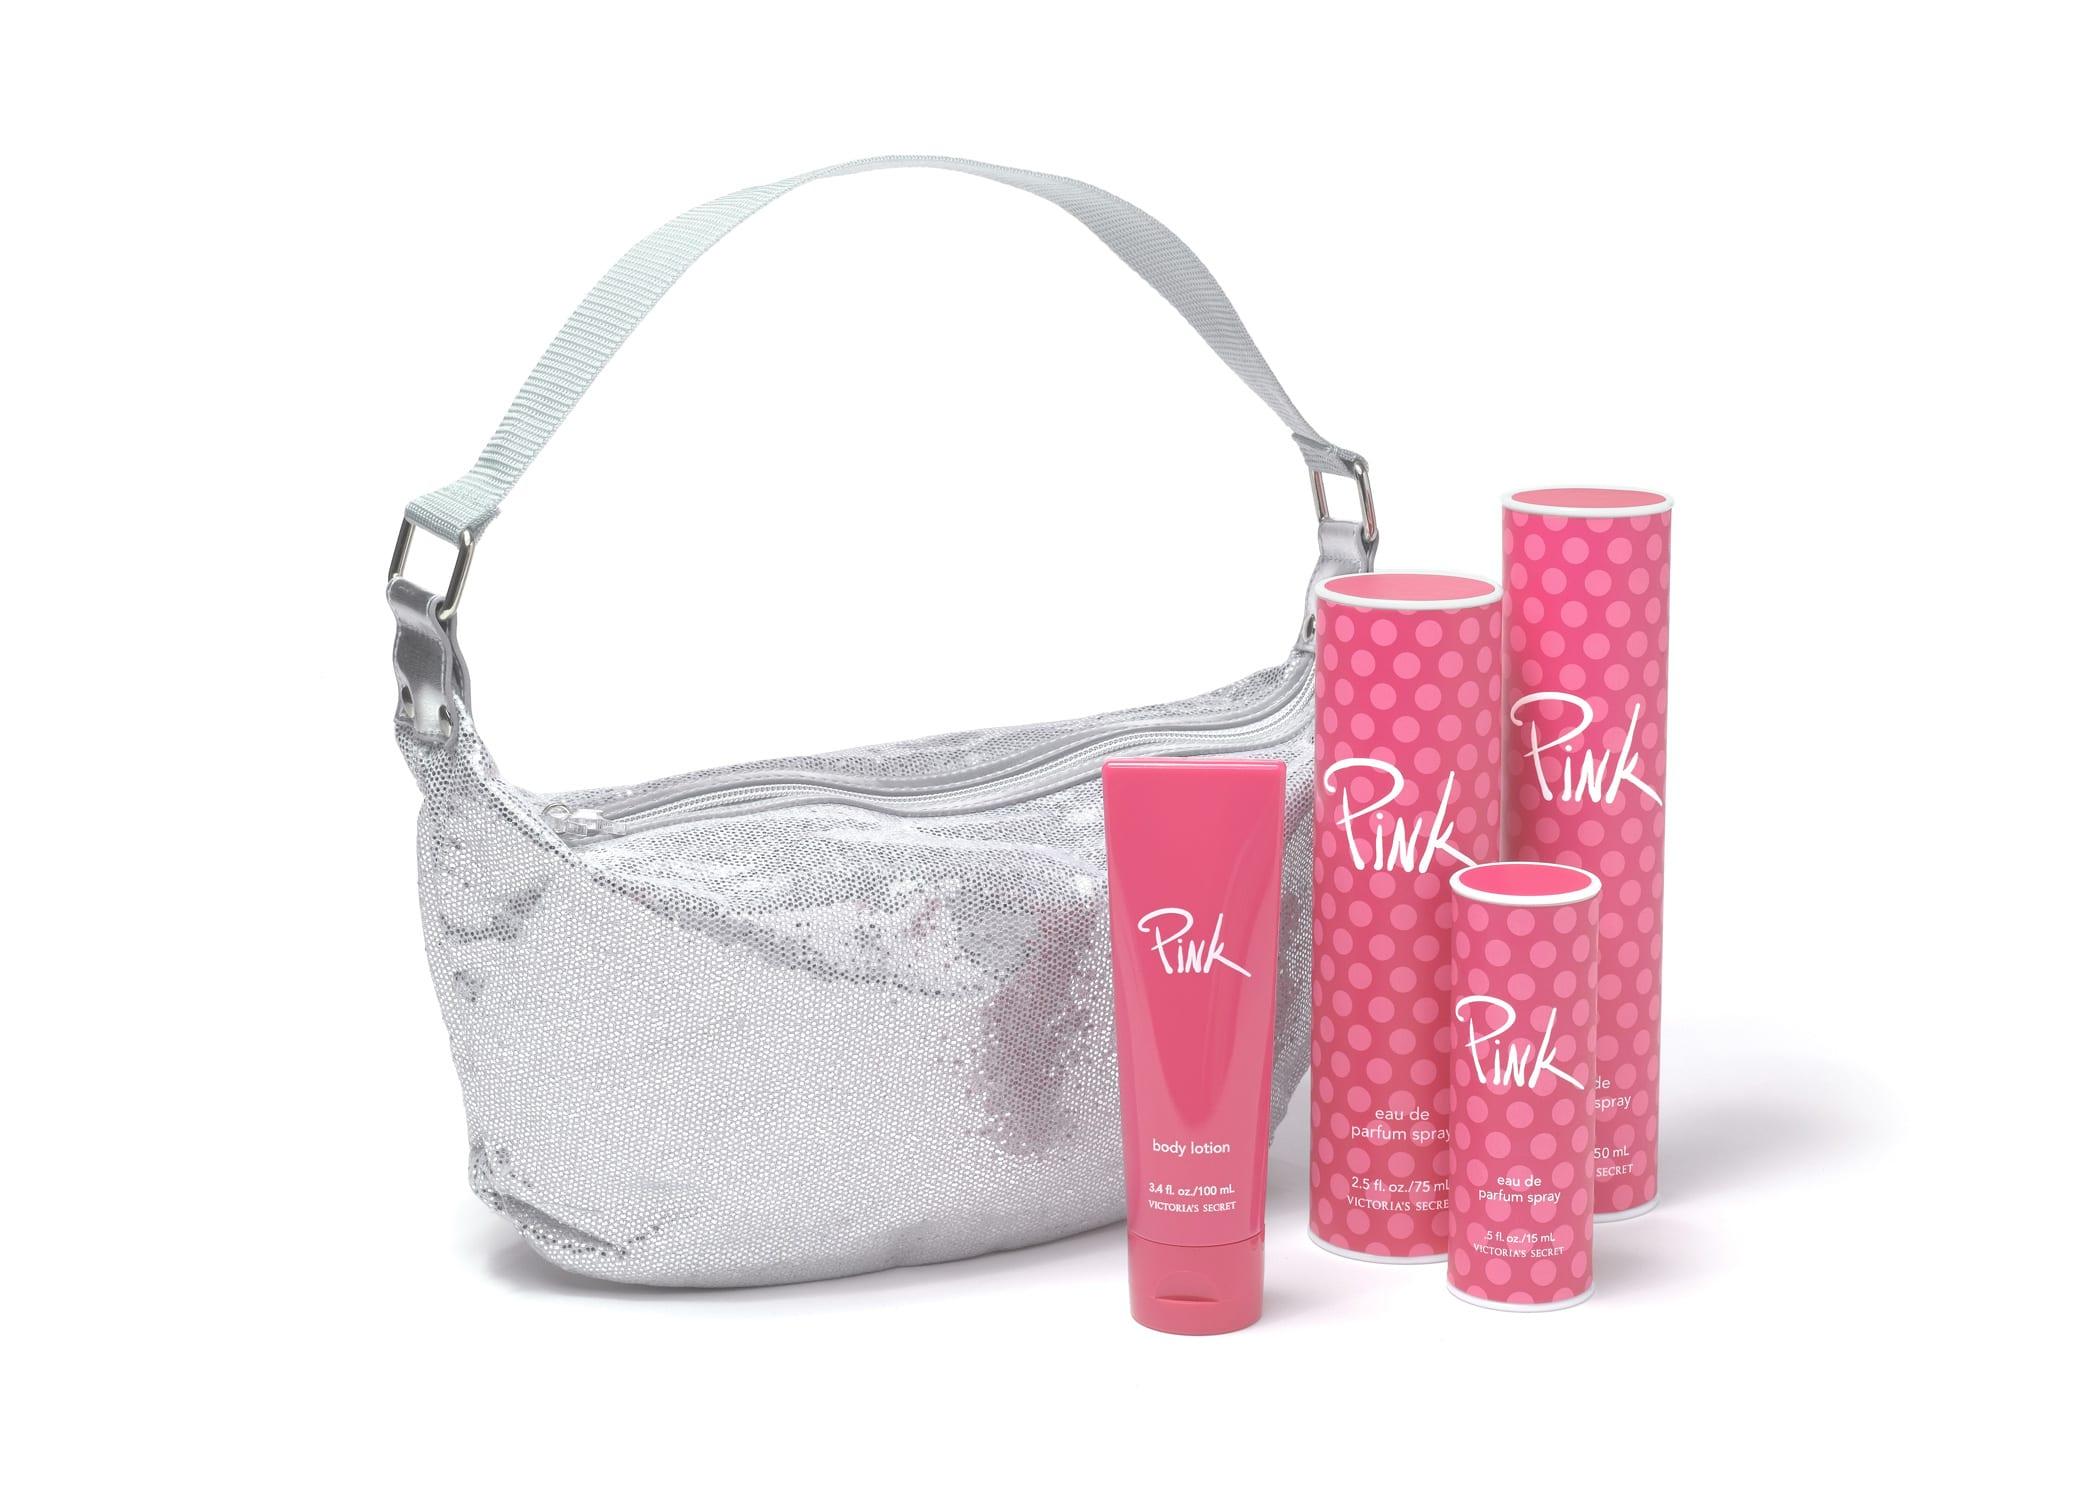 Victoria's Secret Pink packaging design showcasing signature pink fragrance bottles with polka dots and silver handbag.